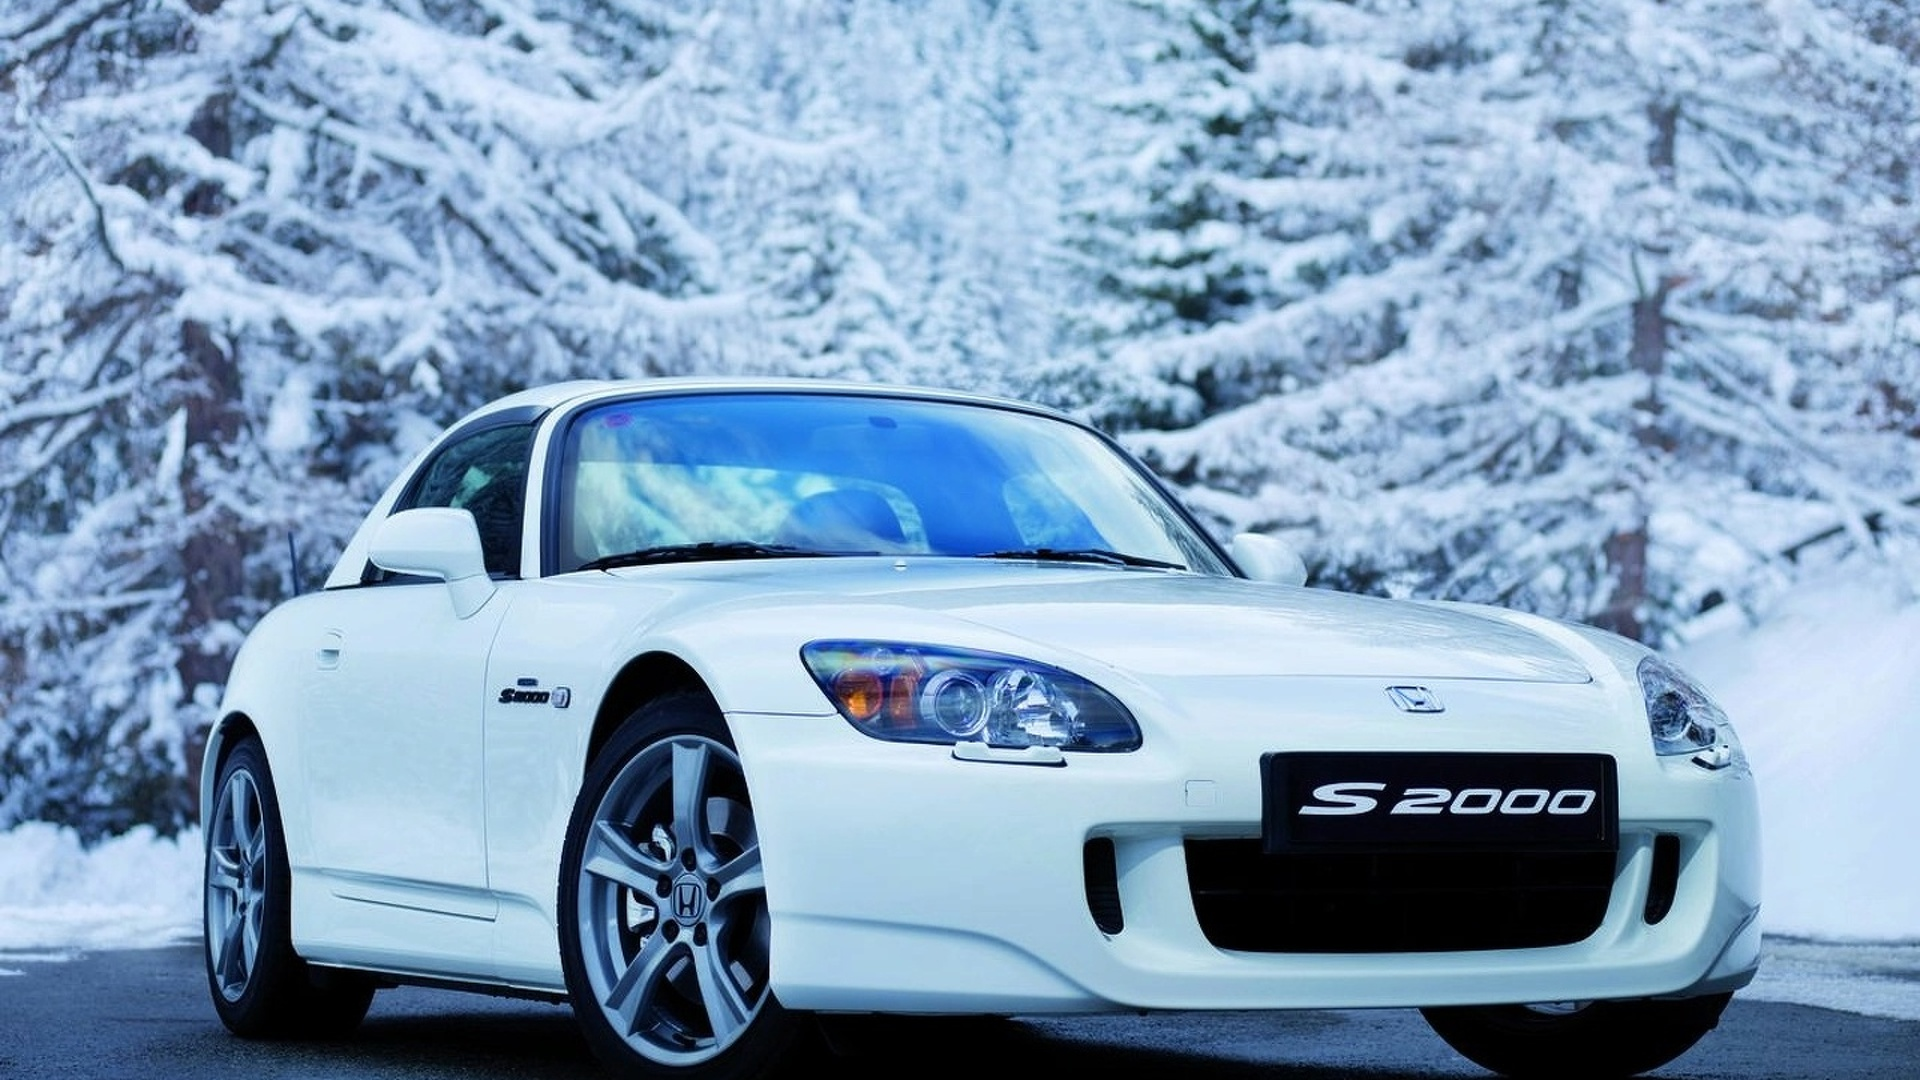 Honda considering an S2000 successor - report